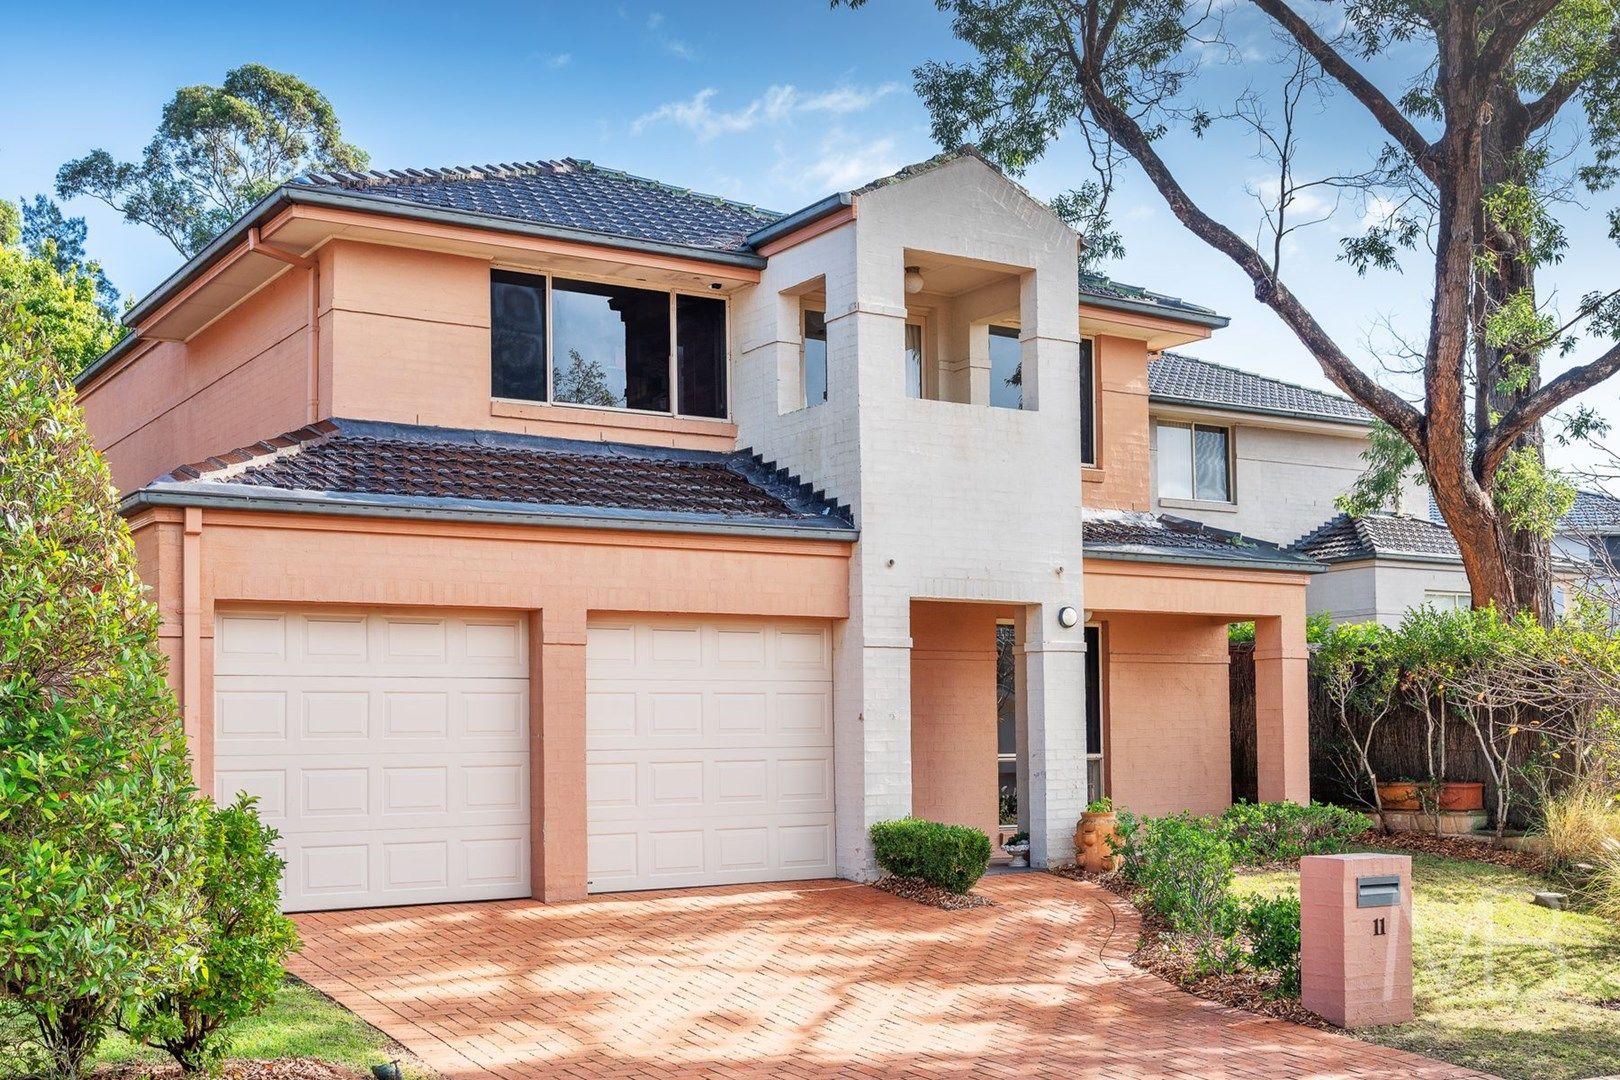 11 Corella Way, Westleigh NSW 2120, Image 0